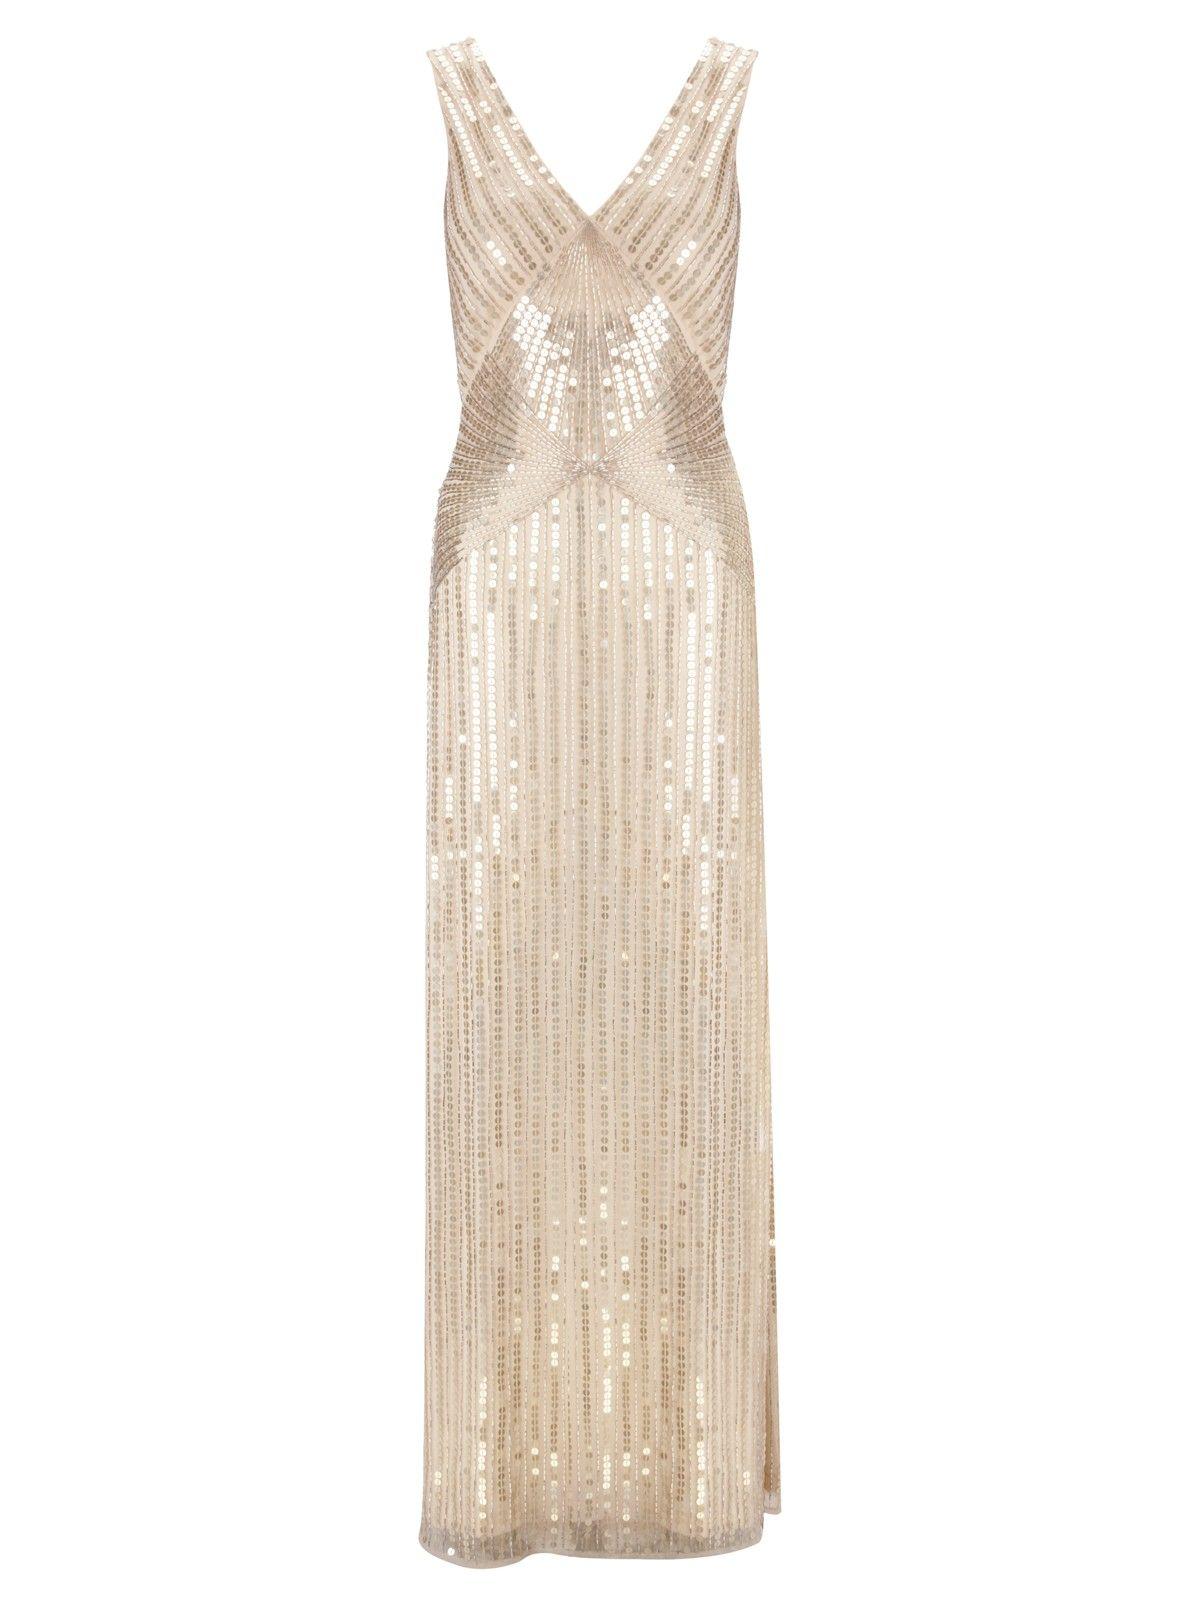 1920s Dresses Uk Flapper Gatsby Downton Abbey Dress 1920s Fashion Dresses Evening Dress Fashion 1920s Fashion